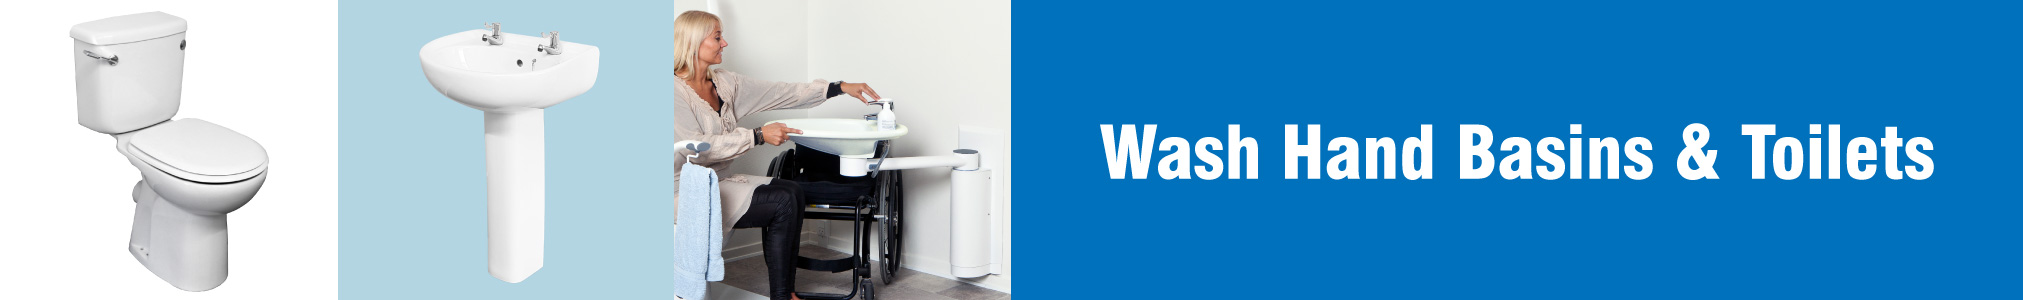 Wash Hand Basins & Toilets banner image